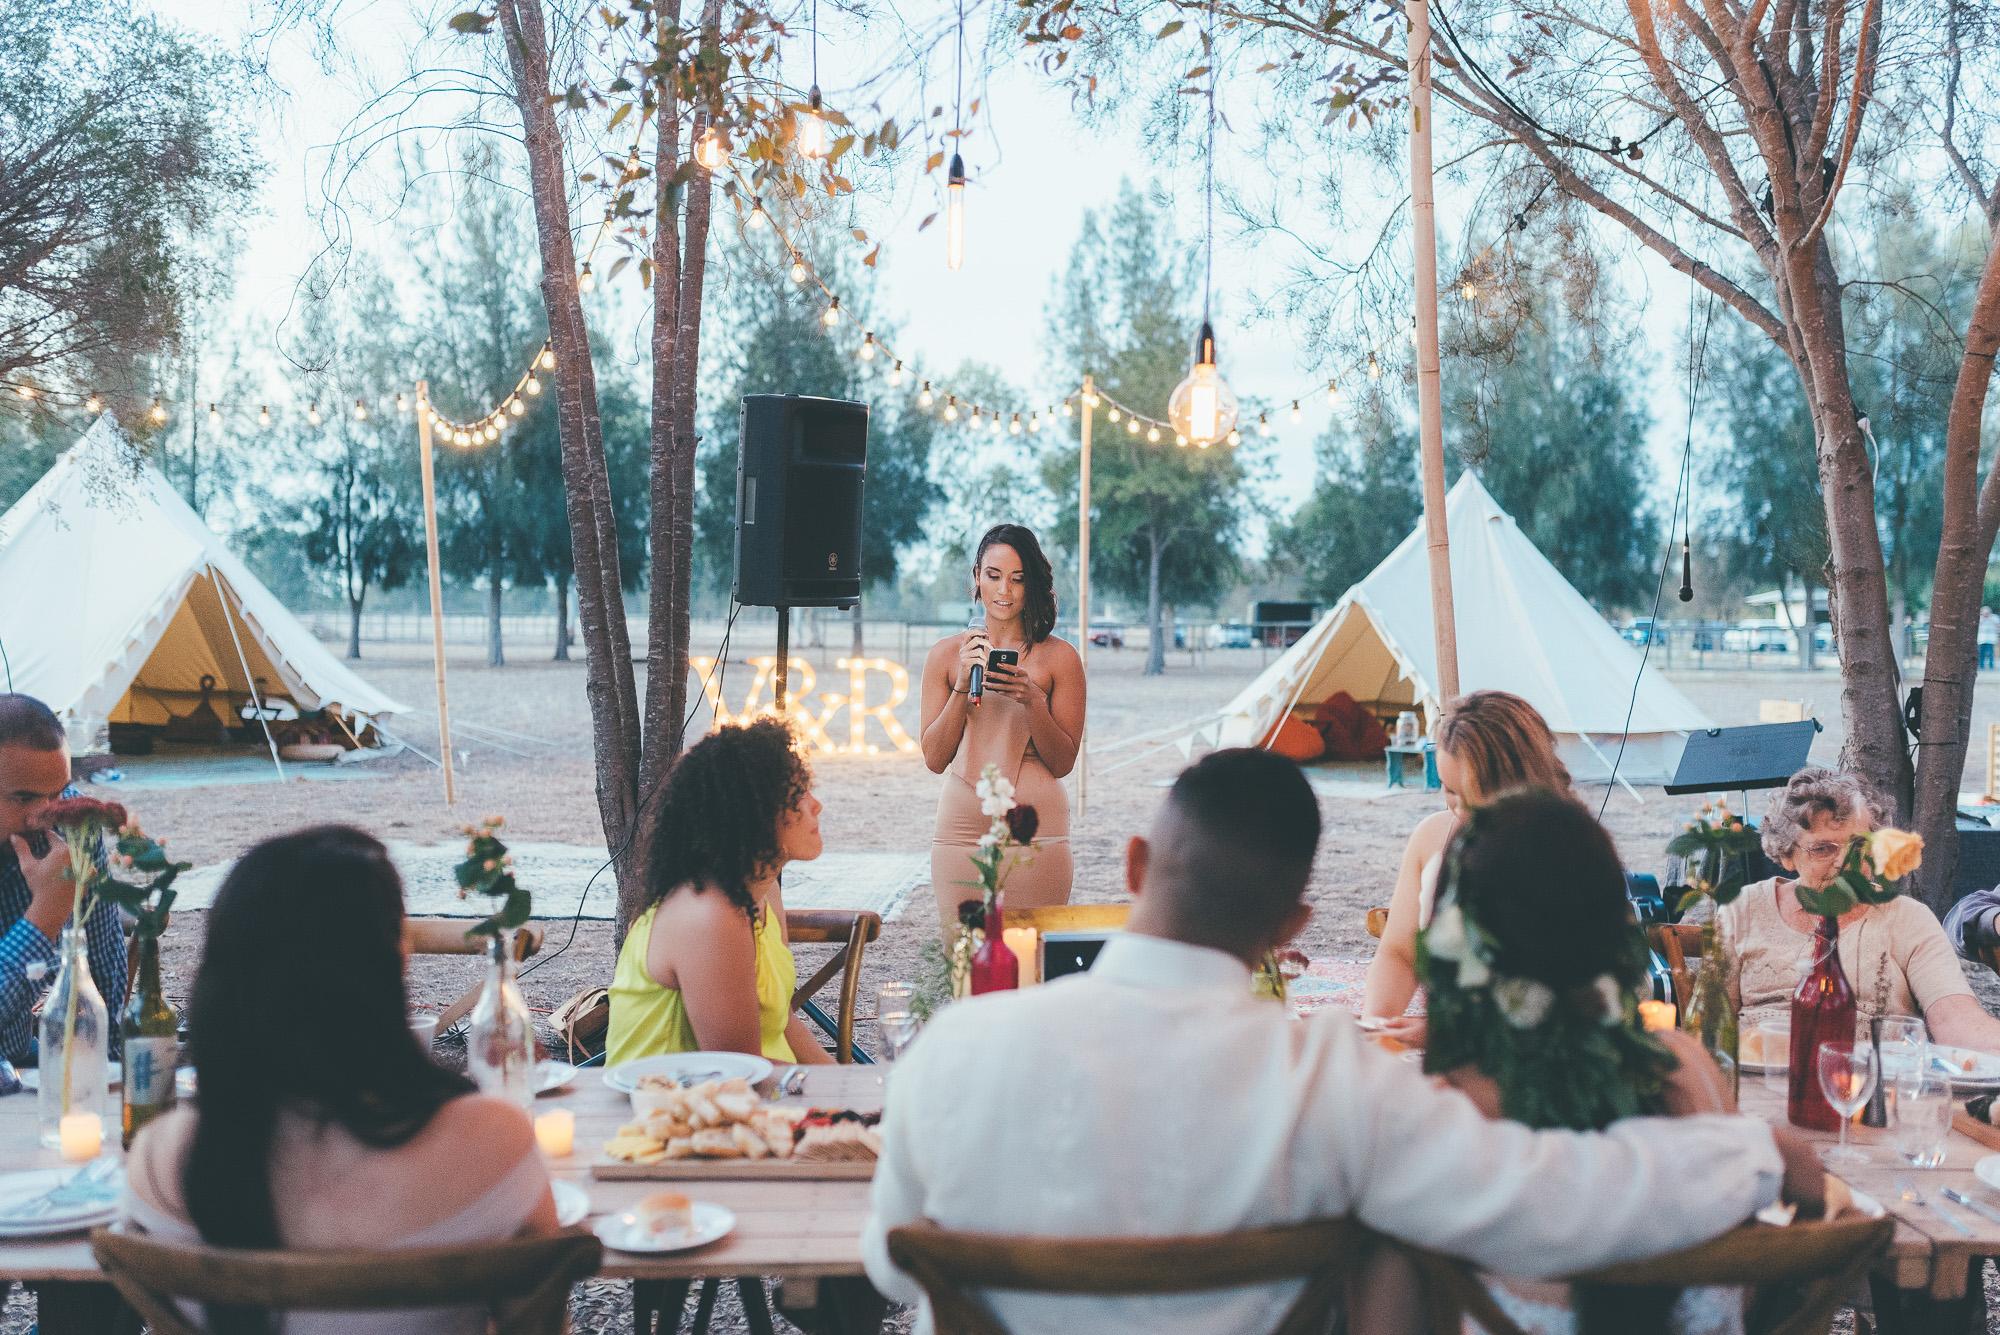 wedding-photographer-outdoor-casual-styled-los-angeles-australia-california-international-earthbound -85.jpg